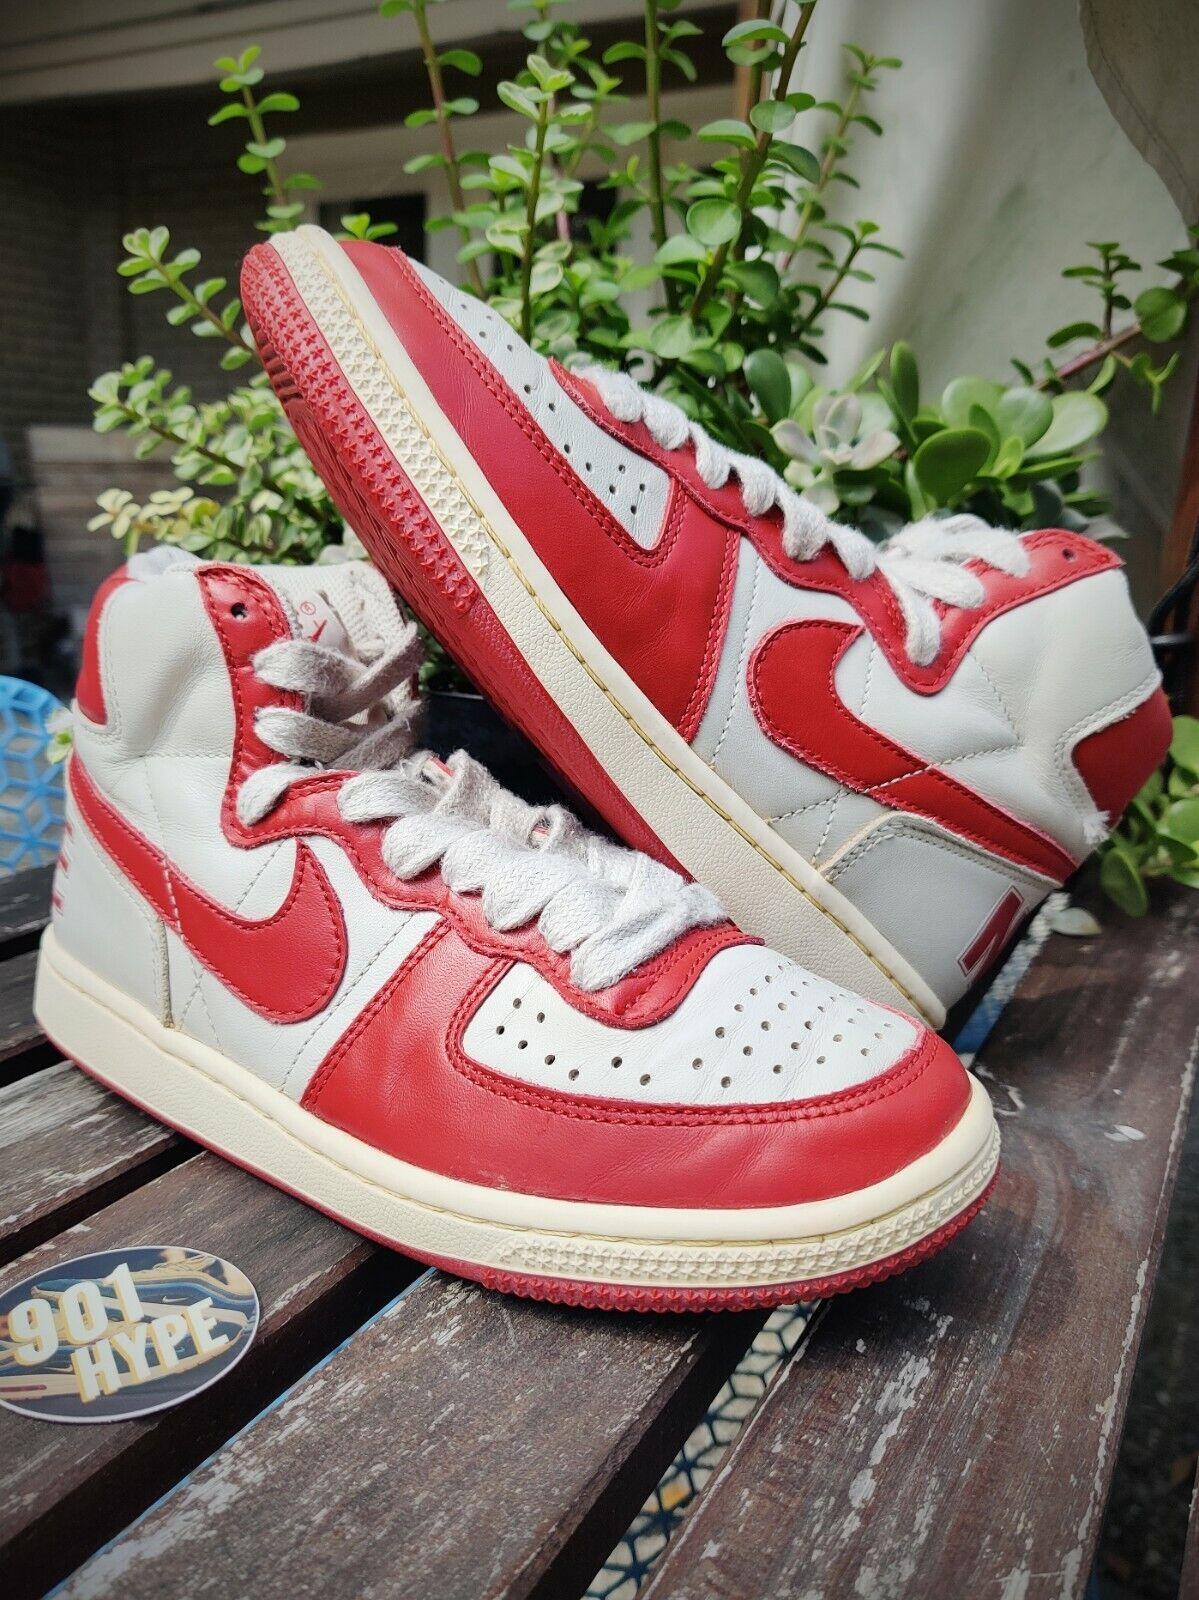 Size 14 - Nike Terminator High Vintage